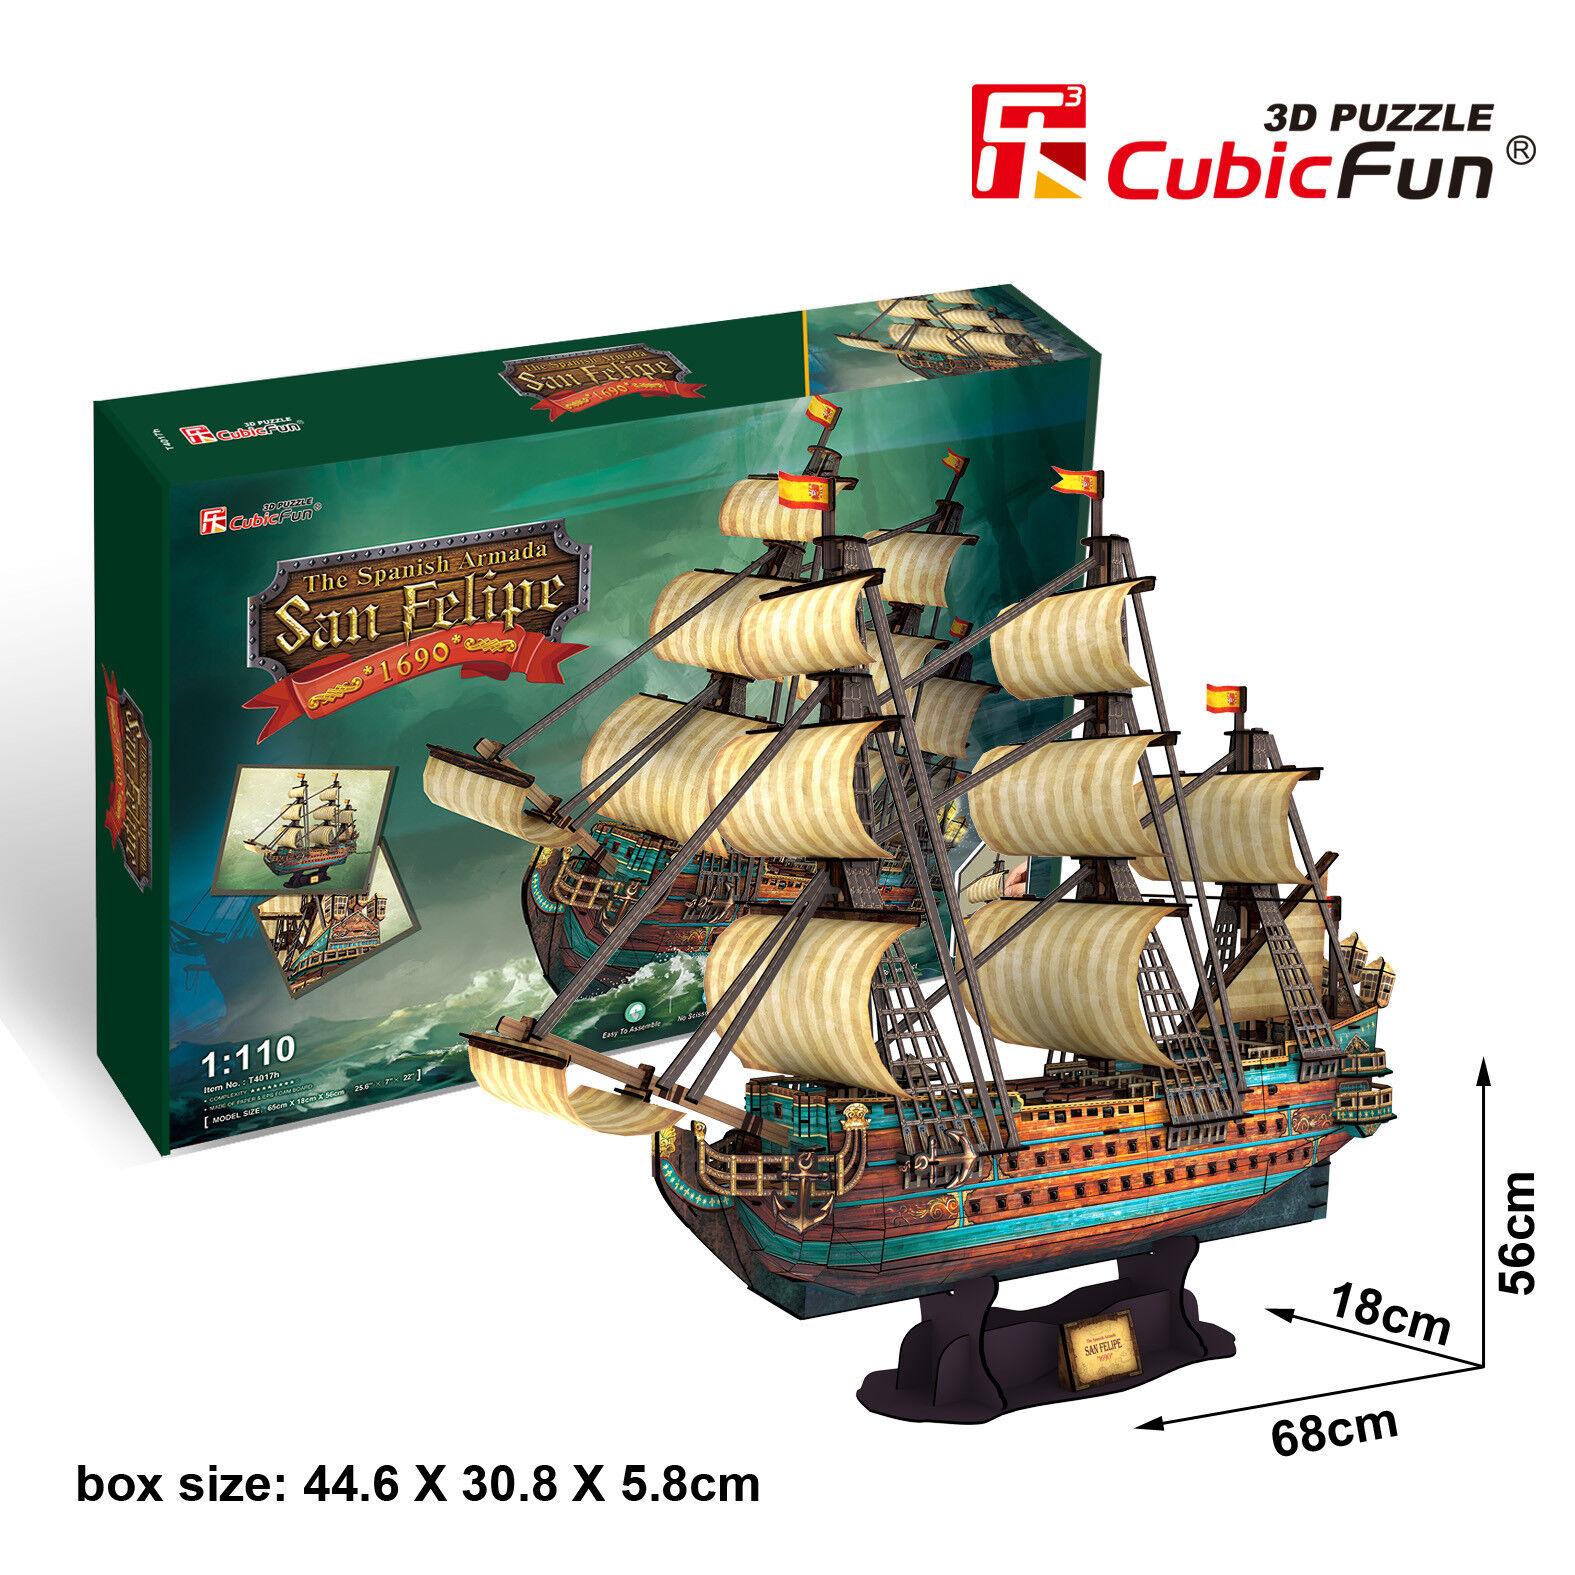 Spanish Armada San Felipe 3D Puzzle Jigsaw Model 248 Pcs 68x18x56cm T4017